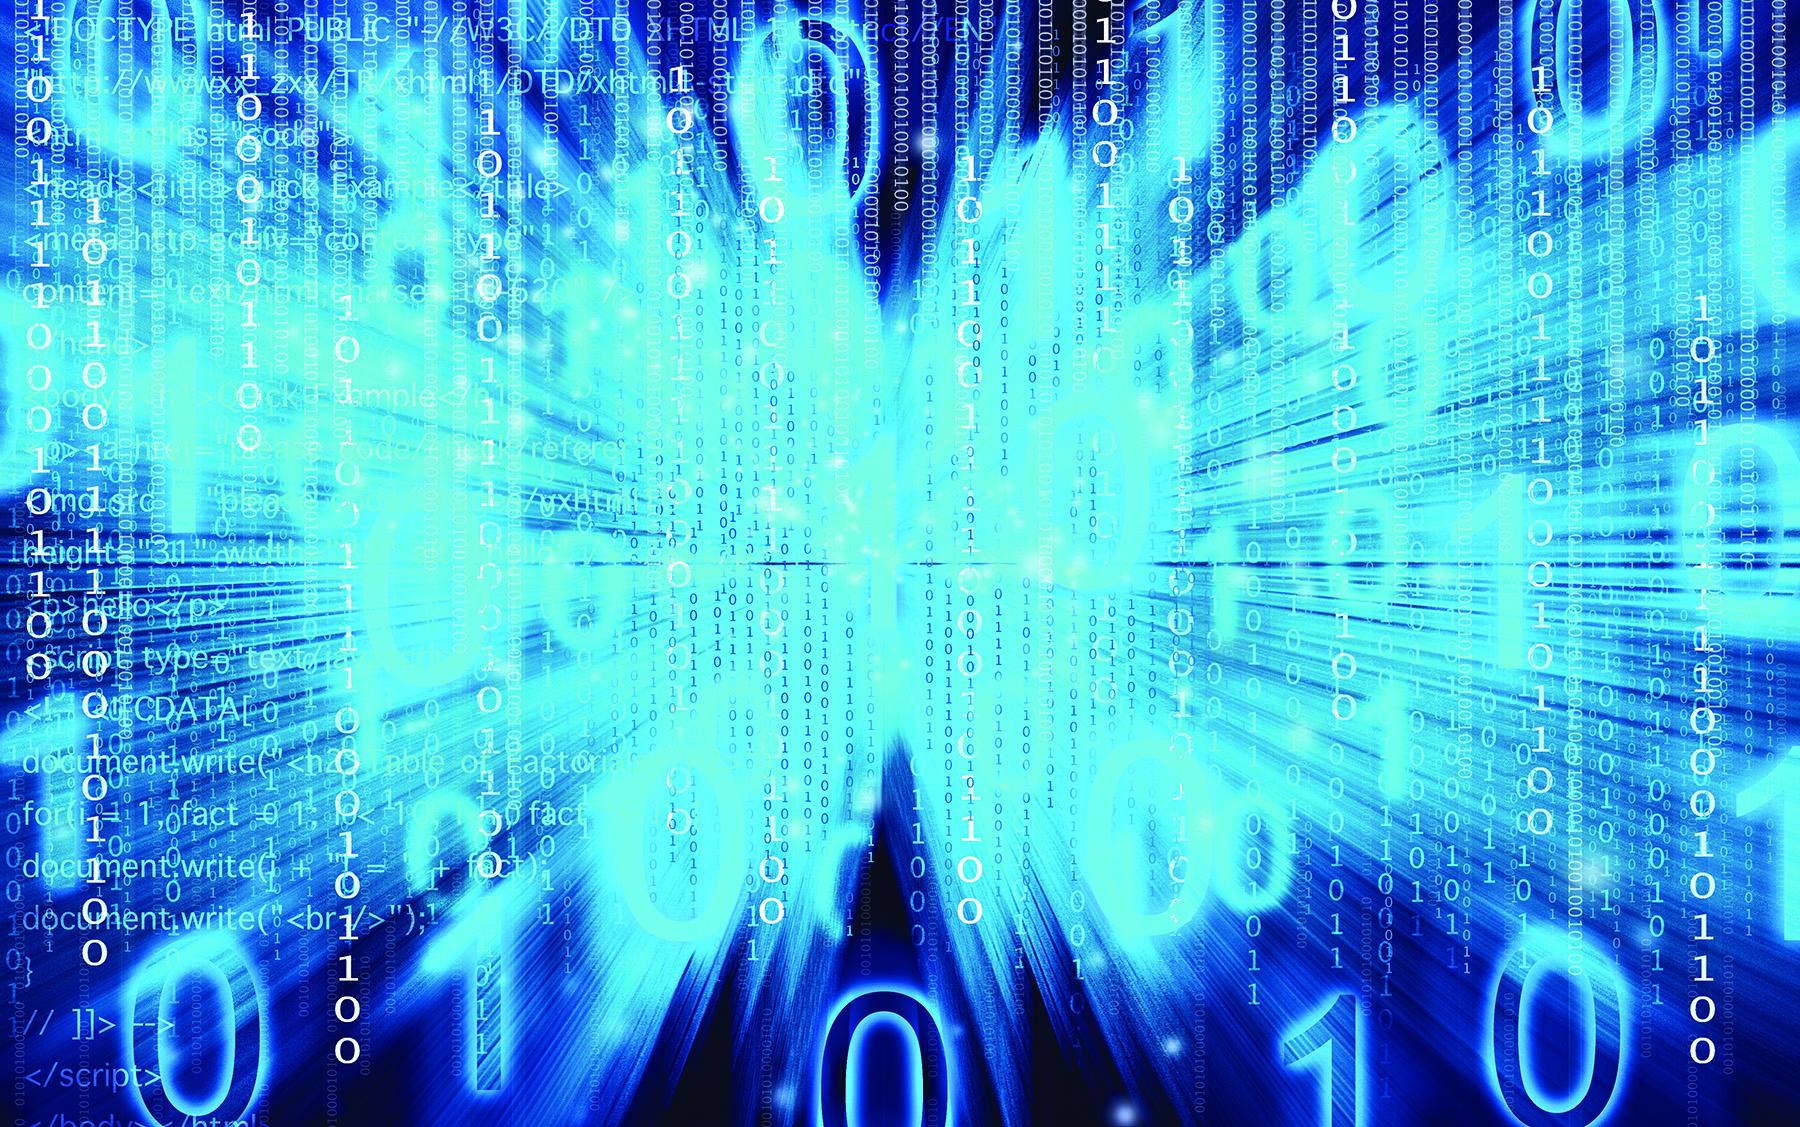 Deloitte taps into the Zen of data analytics